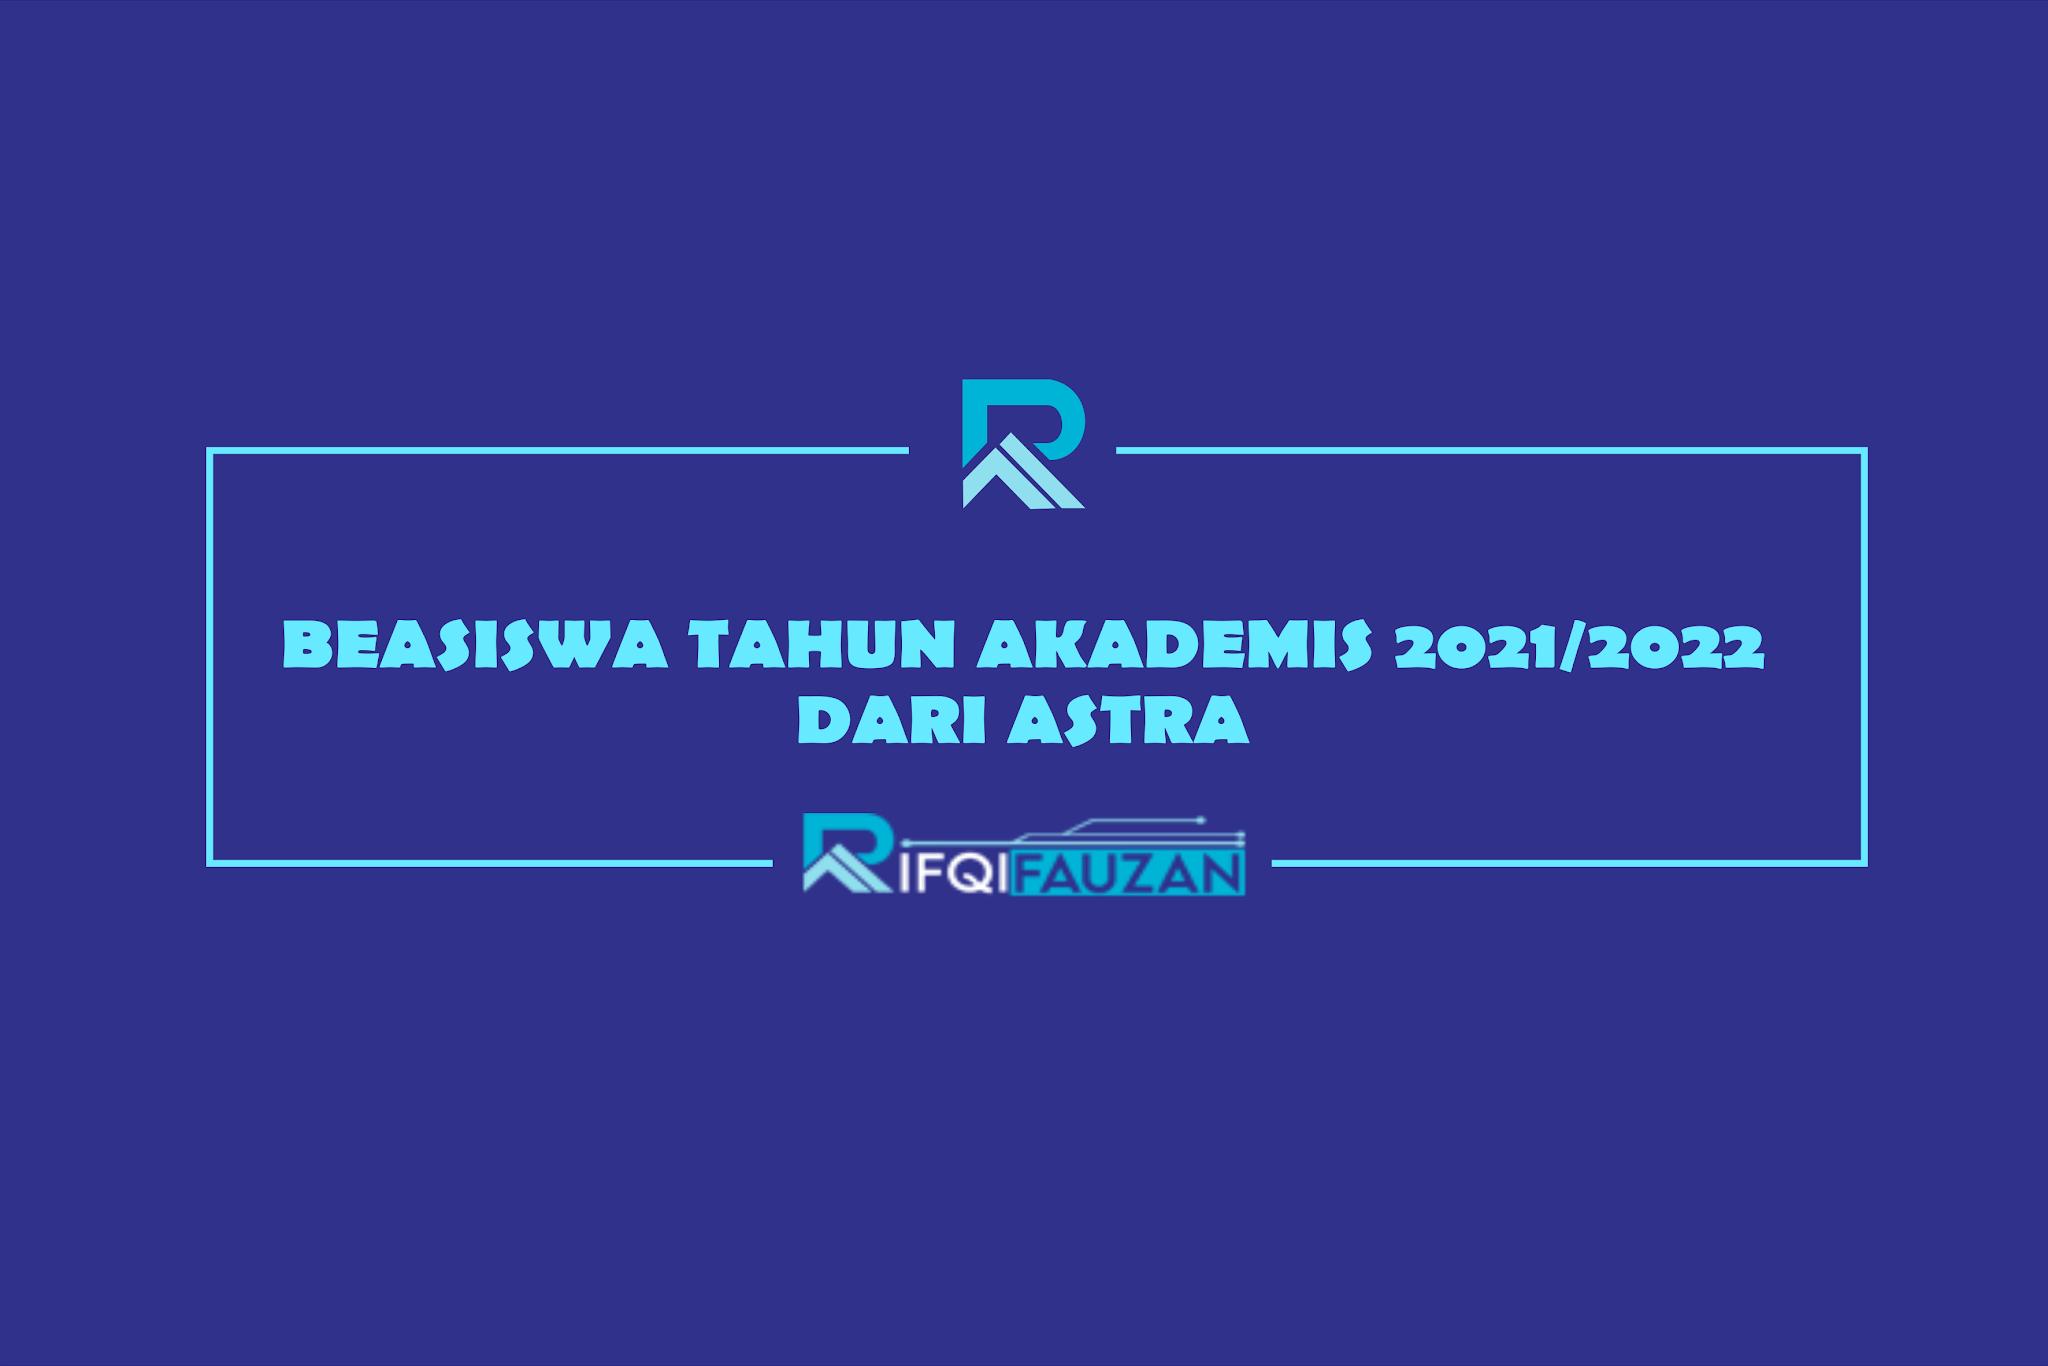 BEASISWA TAHUN AKADEMIS 2021/2022 DARI ASTRA